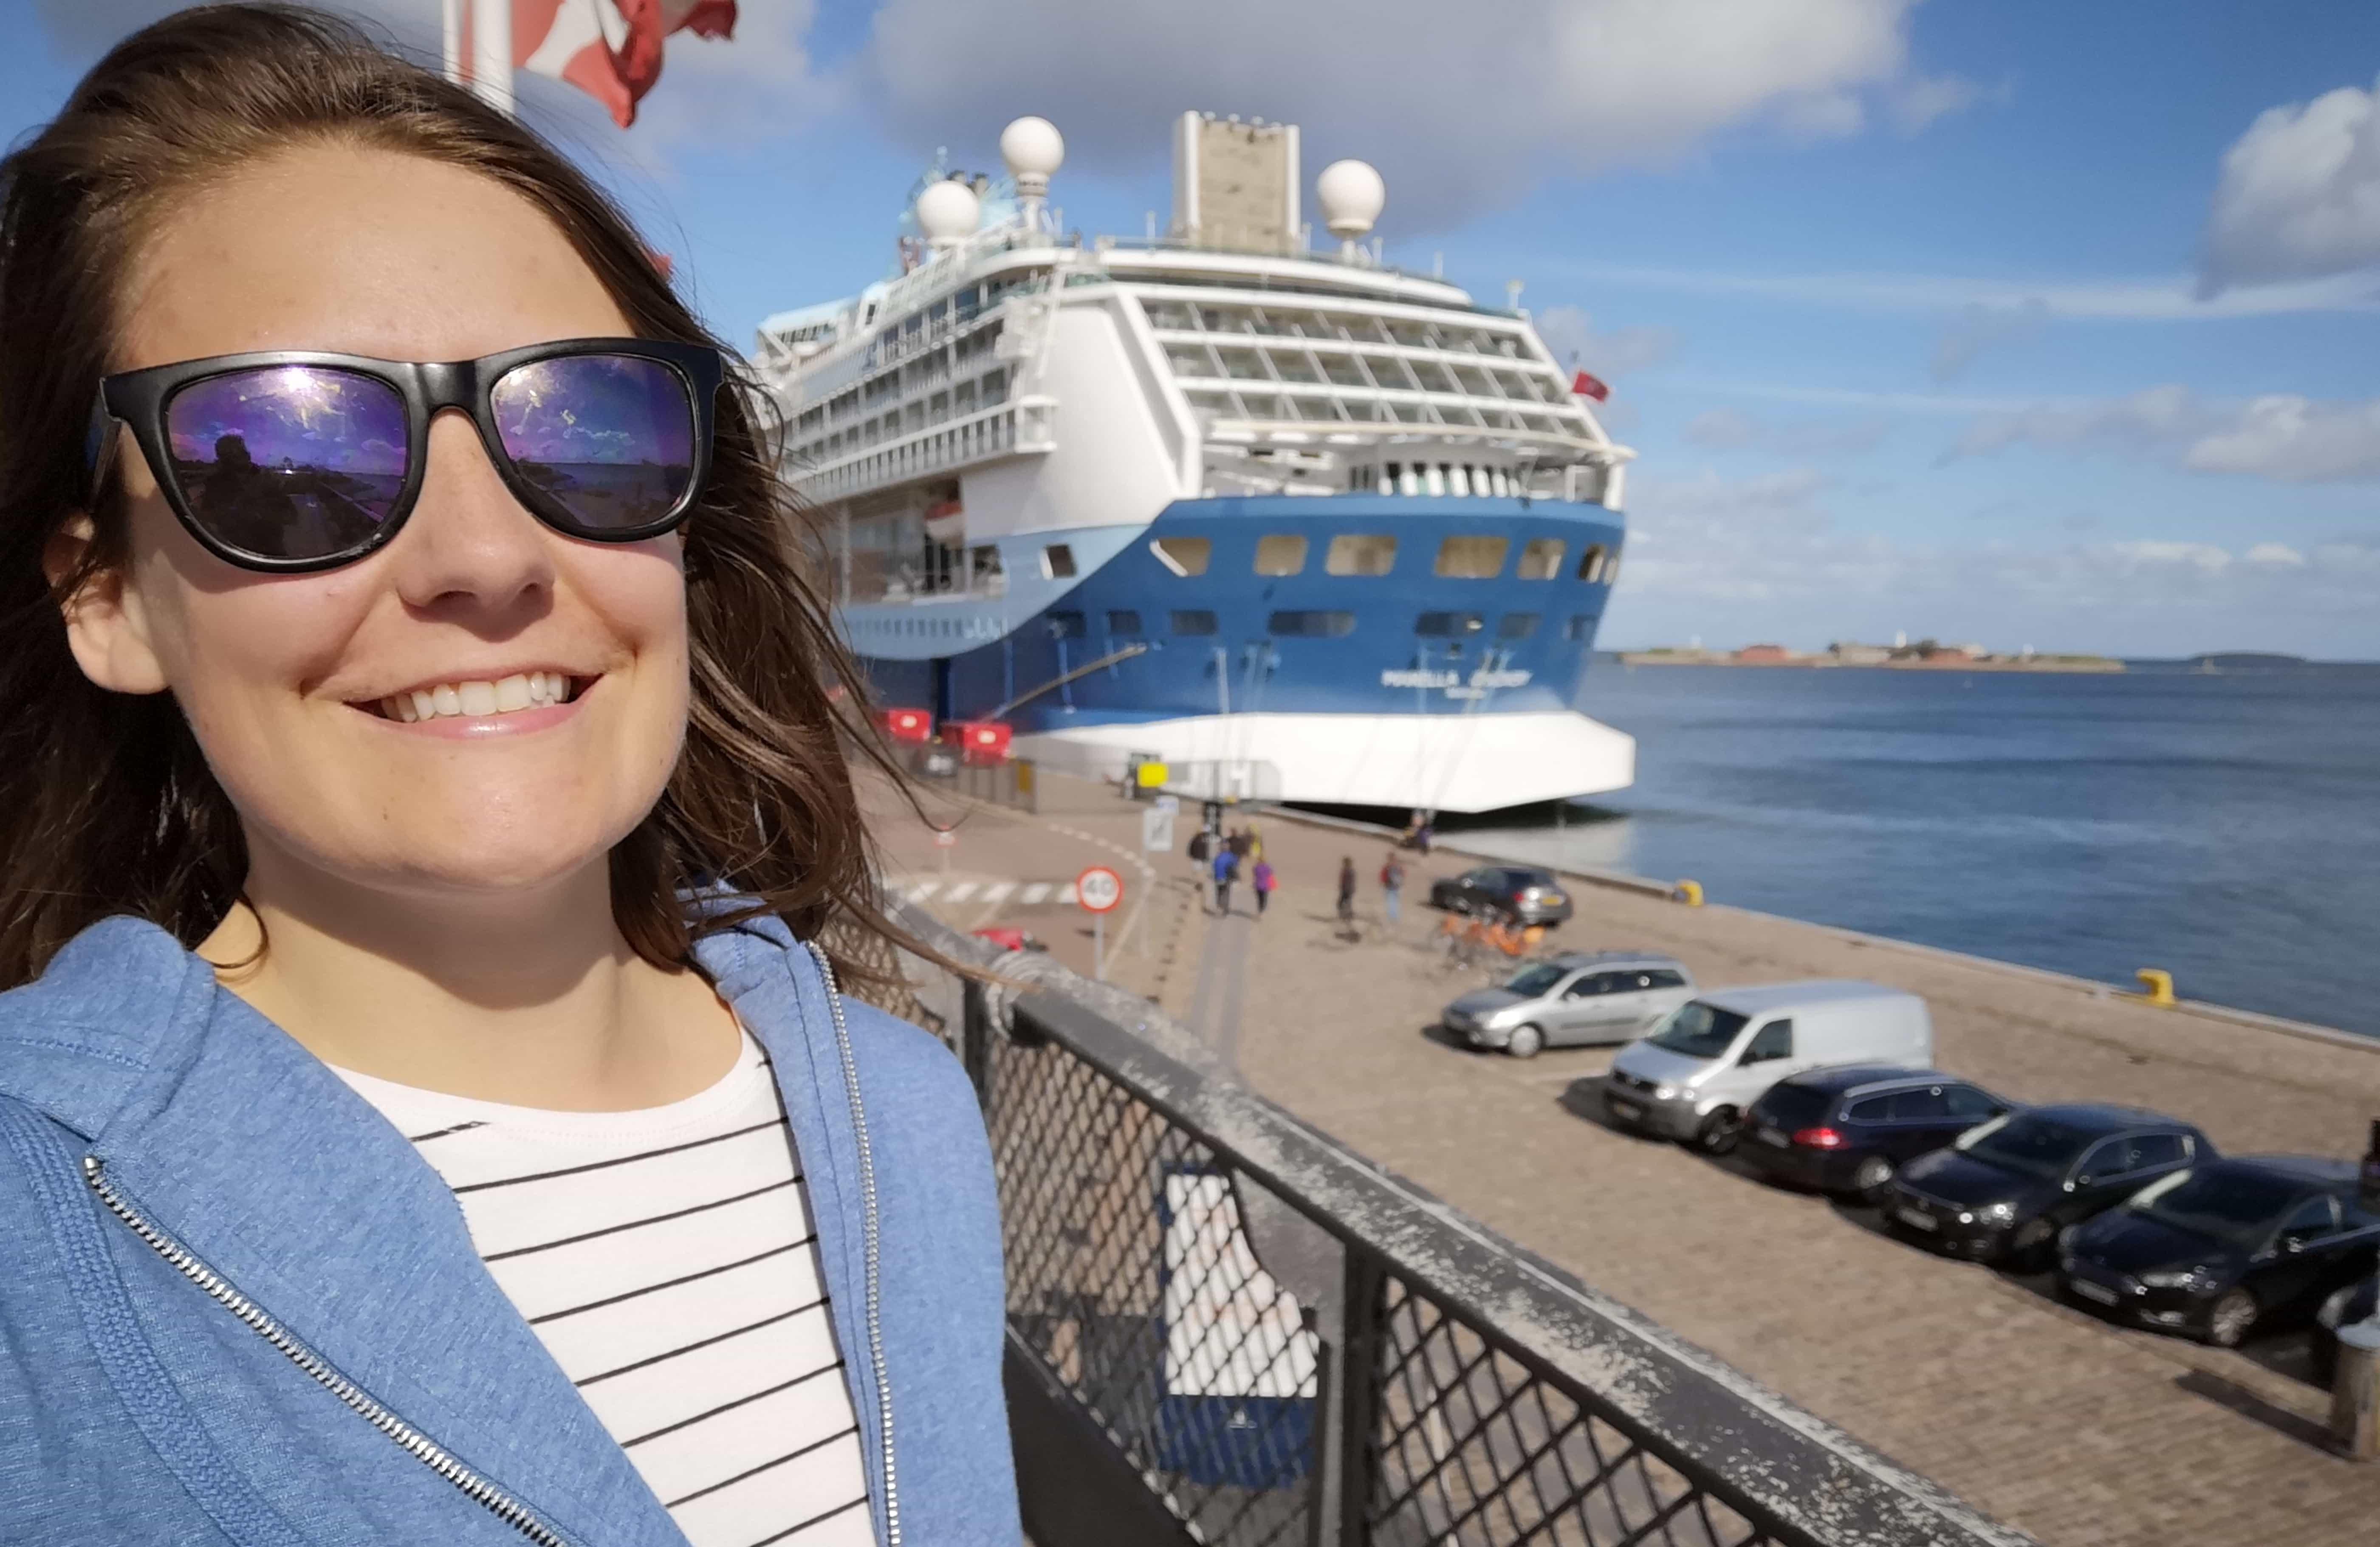 girl and cruise ship marella discovery in copenhagen